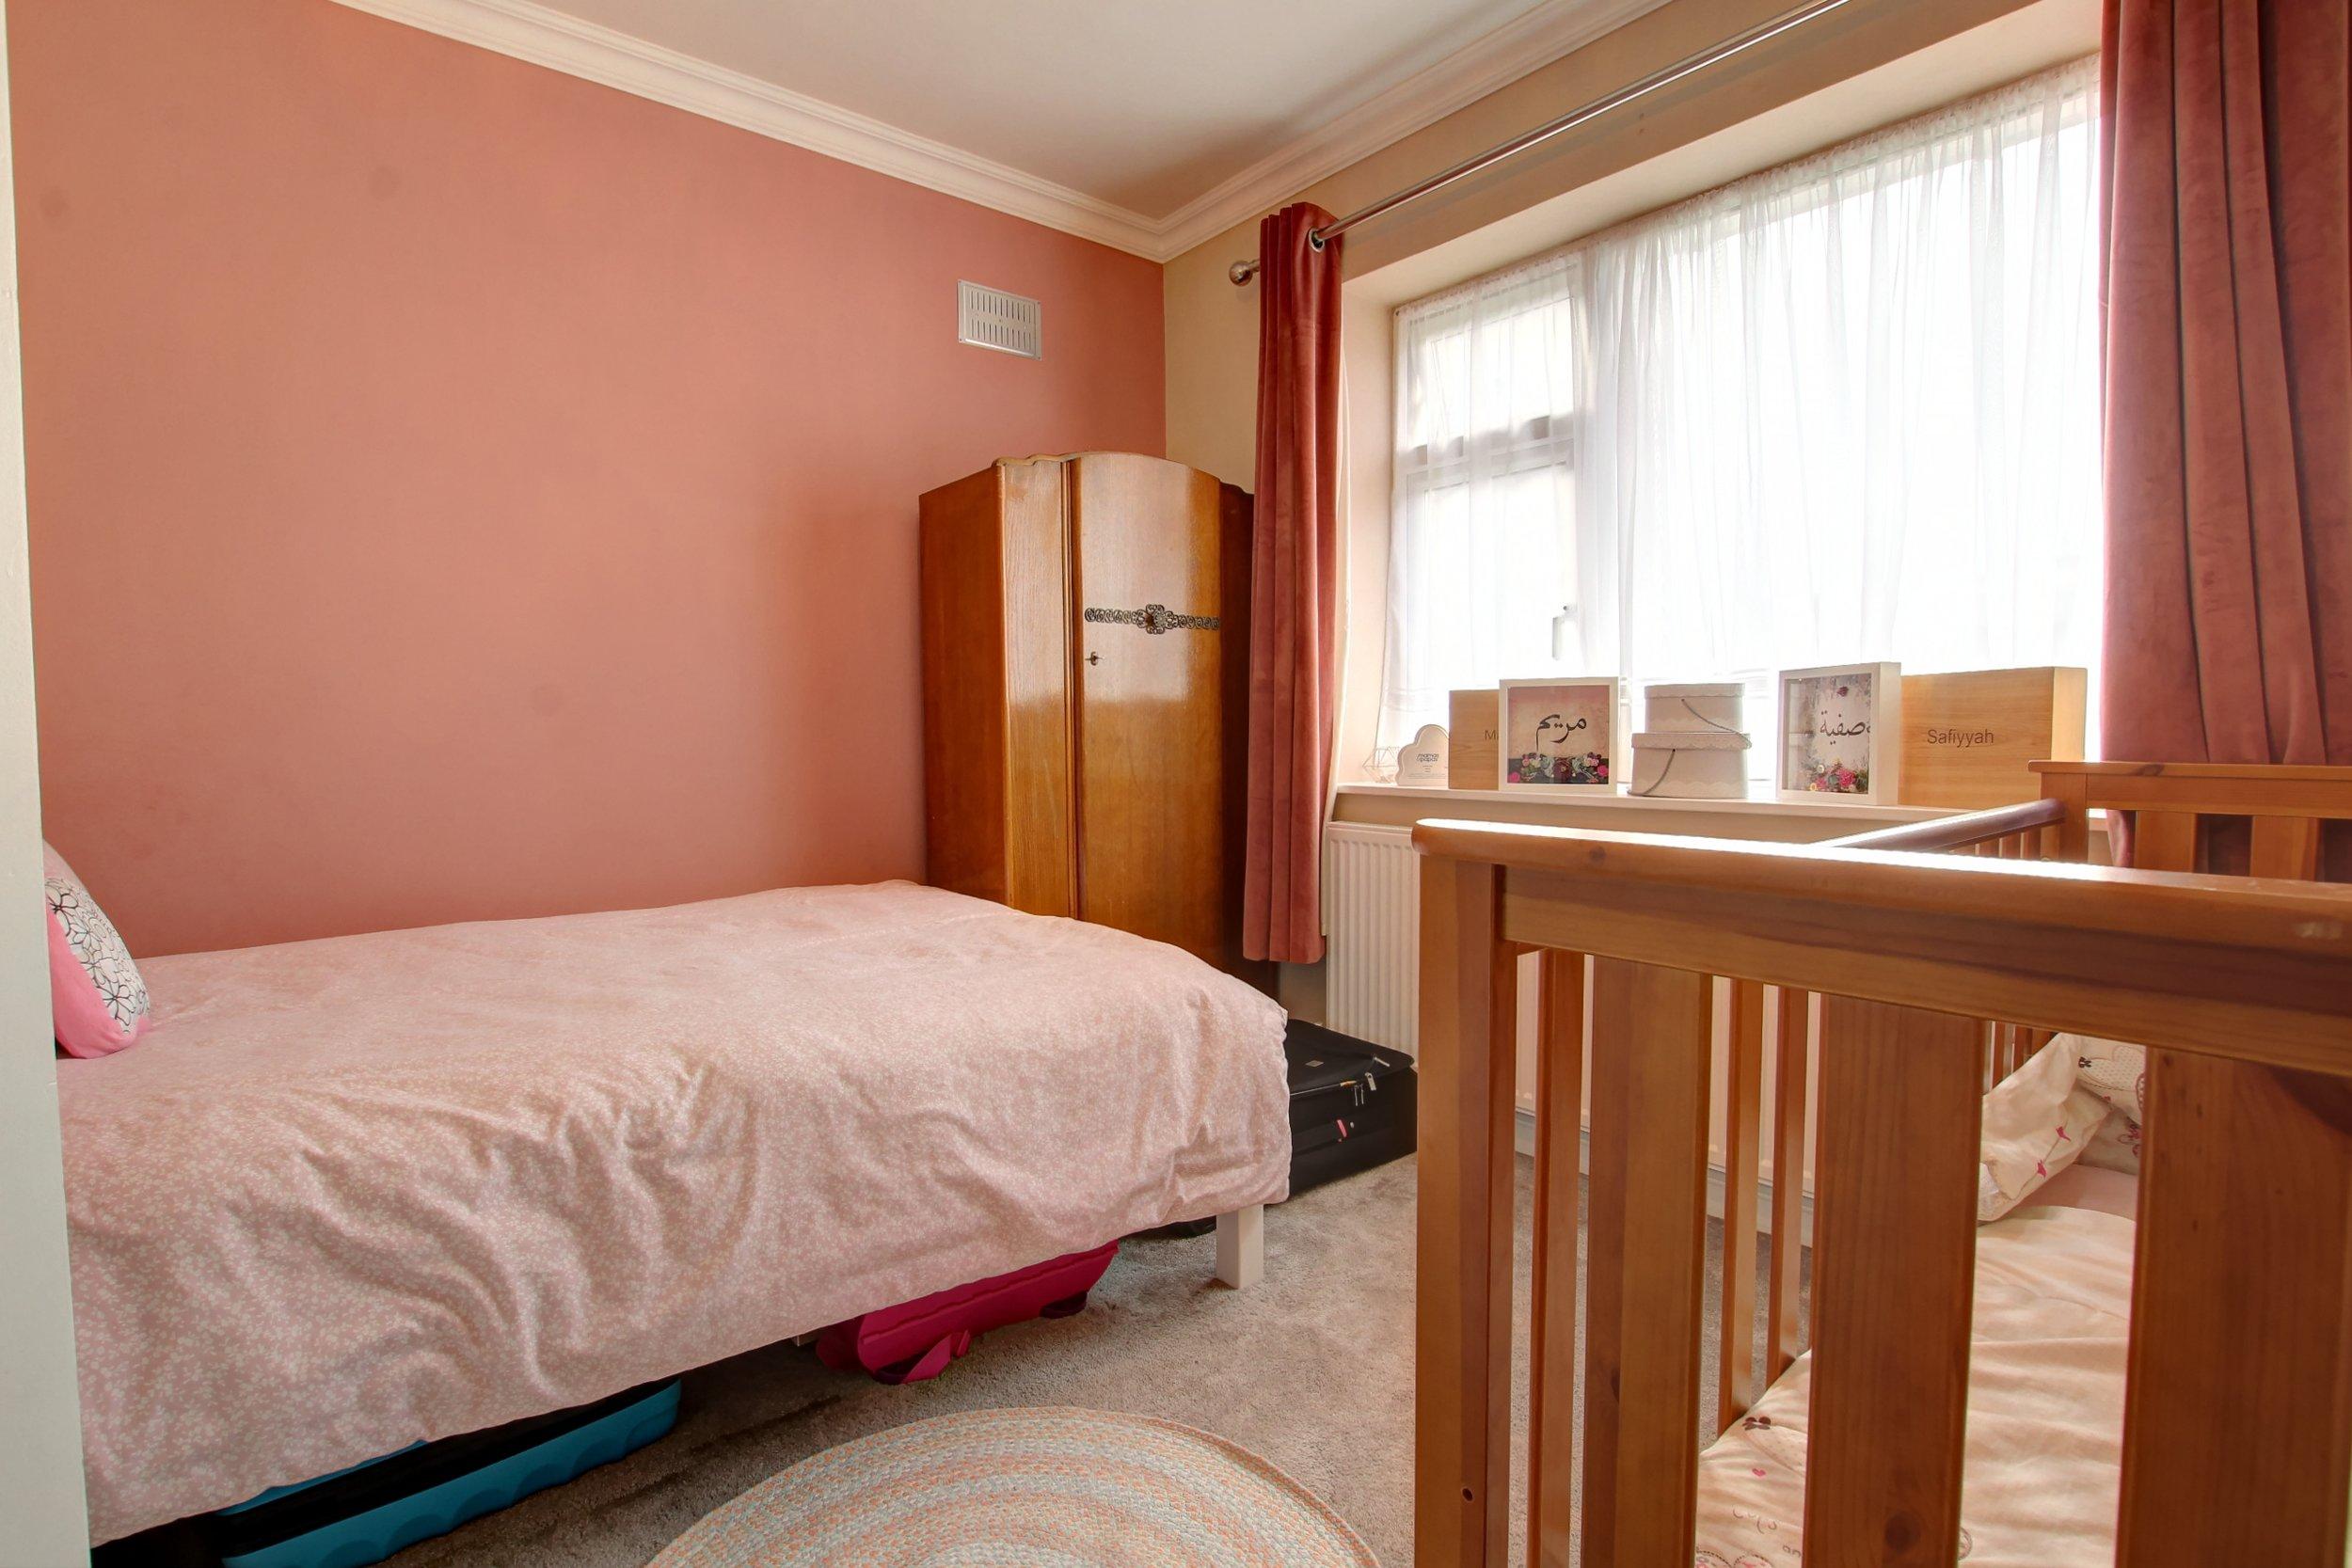 8 bed 2.jpg